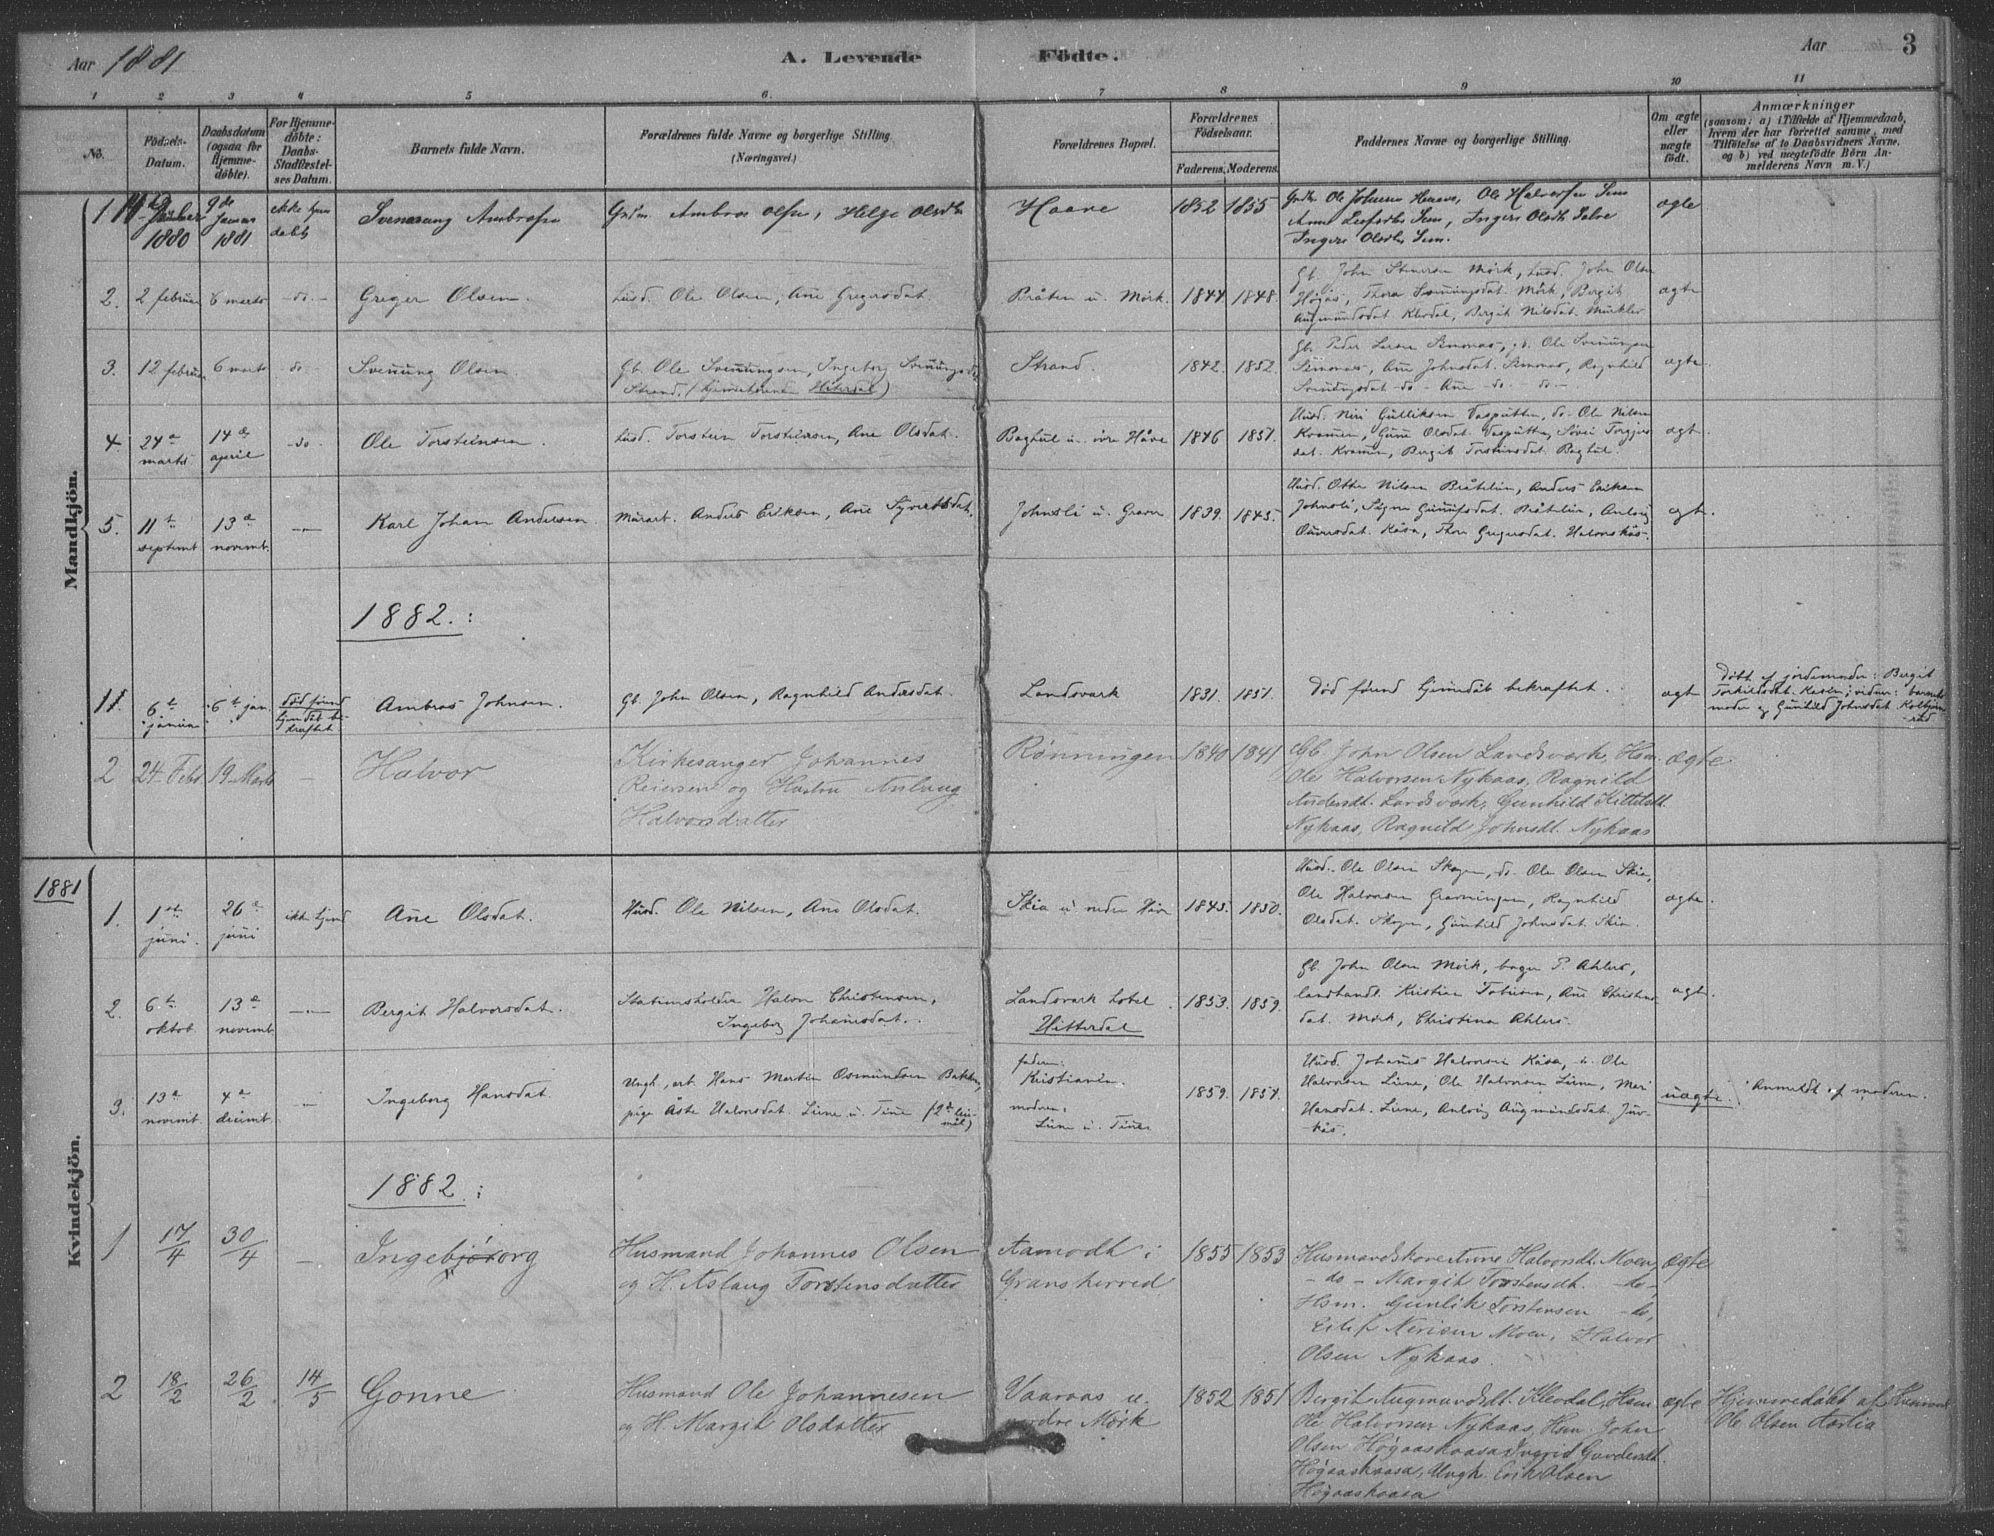 SAKO, Heddal kirkebøker, F/Fb/L0002: Ministerialbok nr. II 2, 1878-1913, s. 3